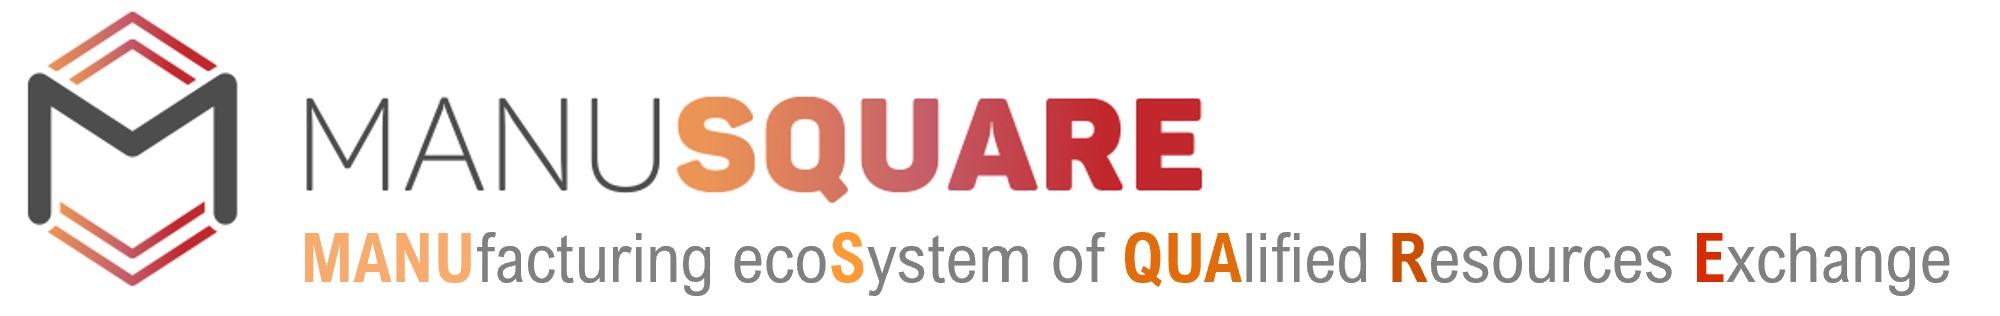 MANUSQUARE_Logo_Sig